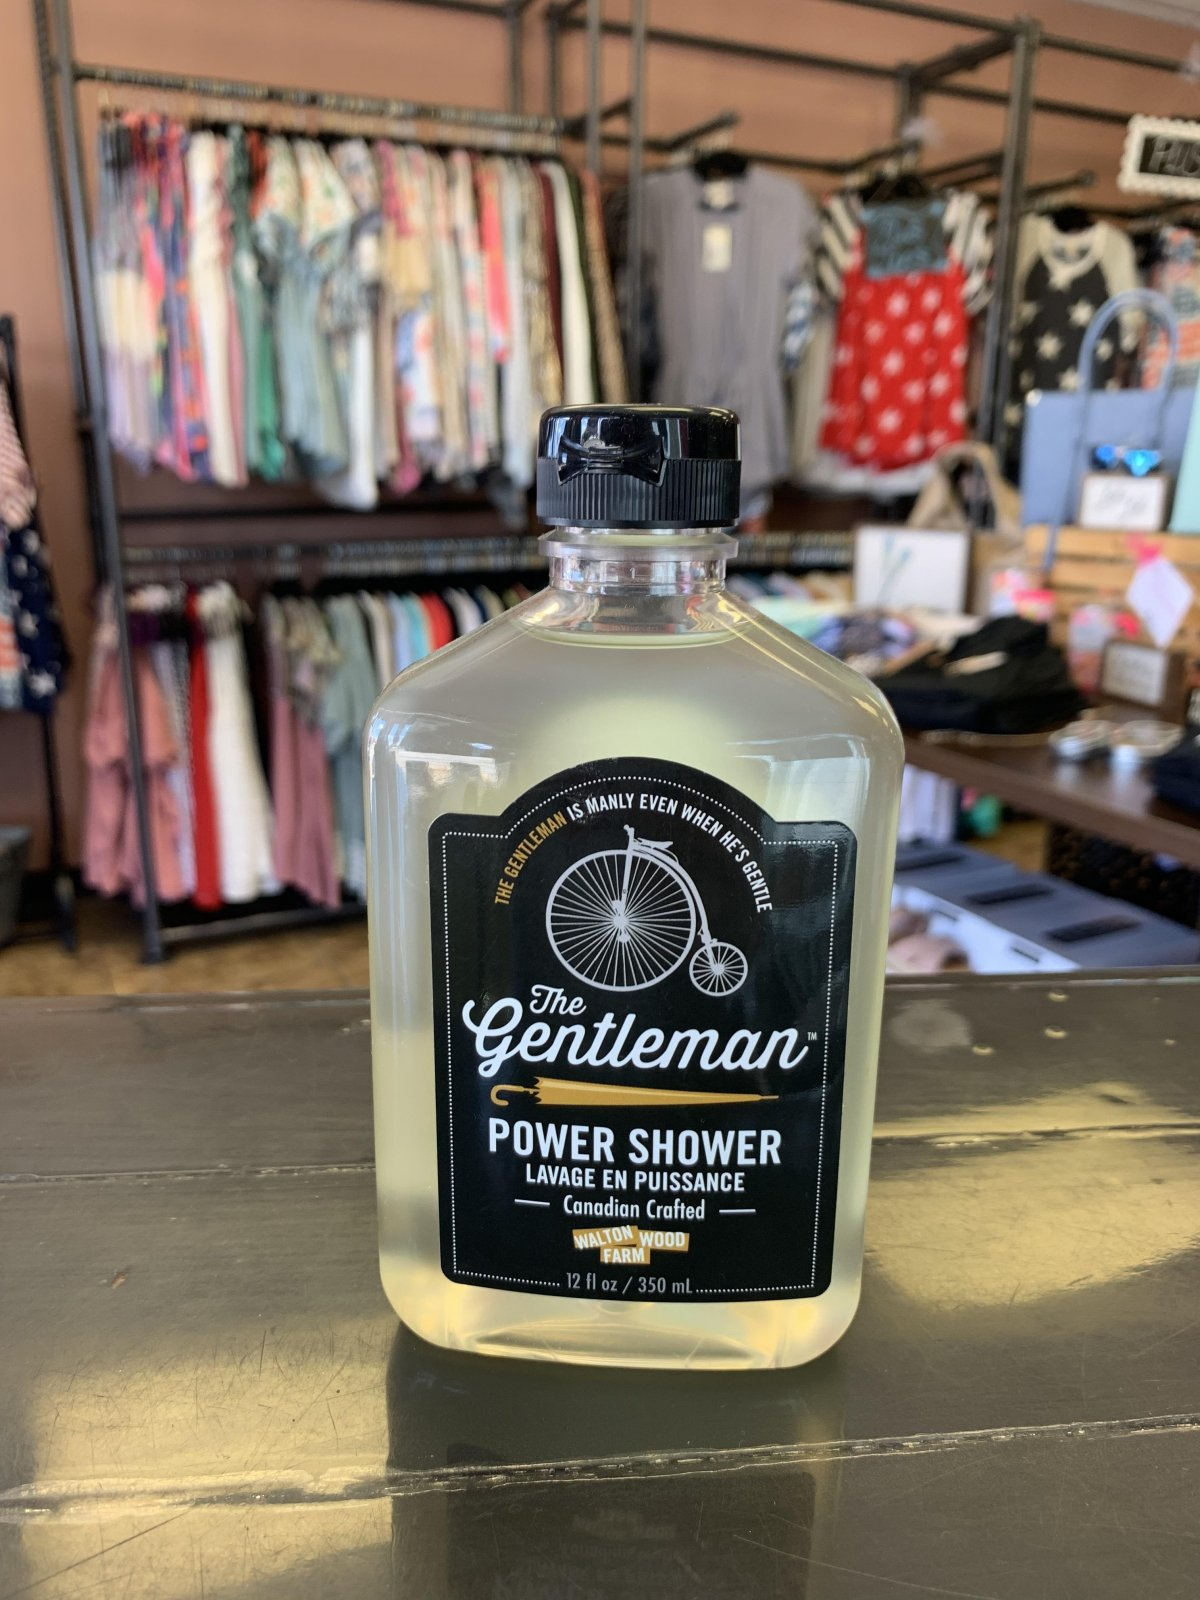 The Gentleman Power Shower